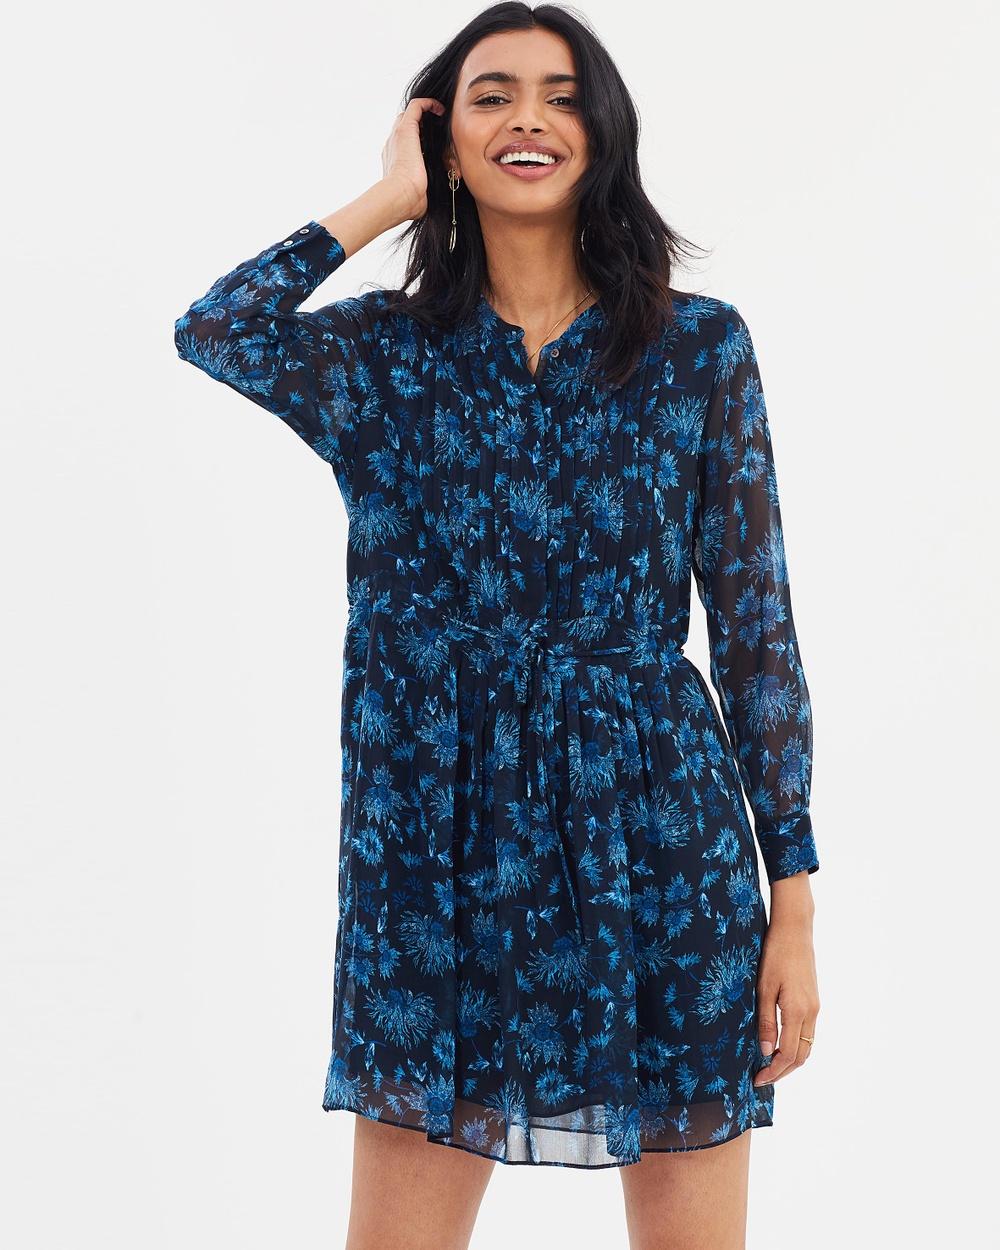 Whistles Pitti Print Shirt Dress Printed Dresses Blue & Multi Pitti Print Shirt Dress